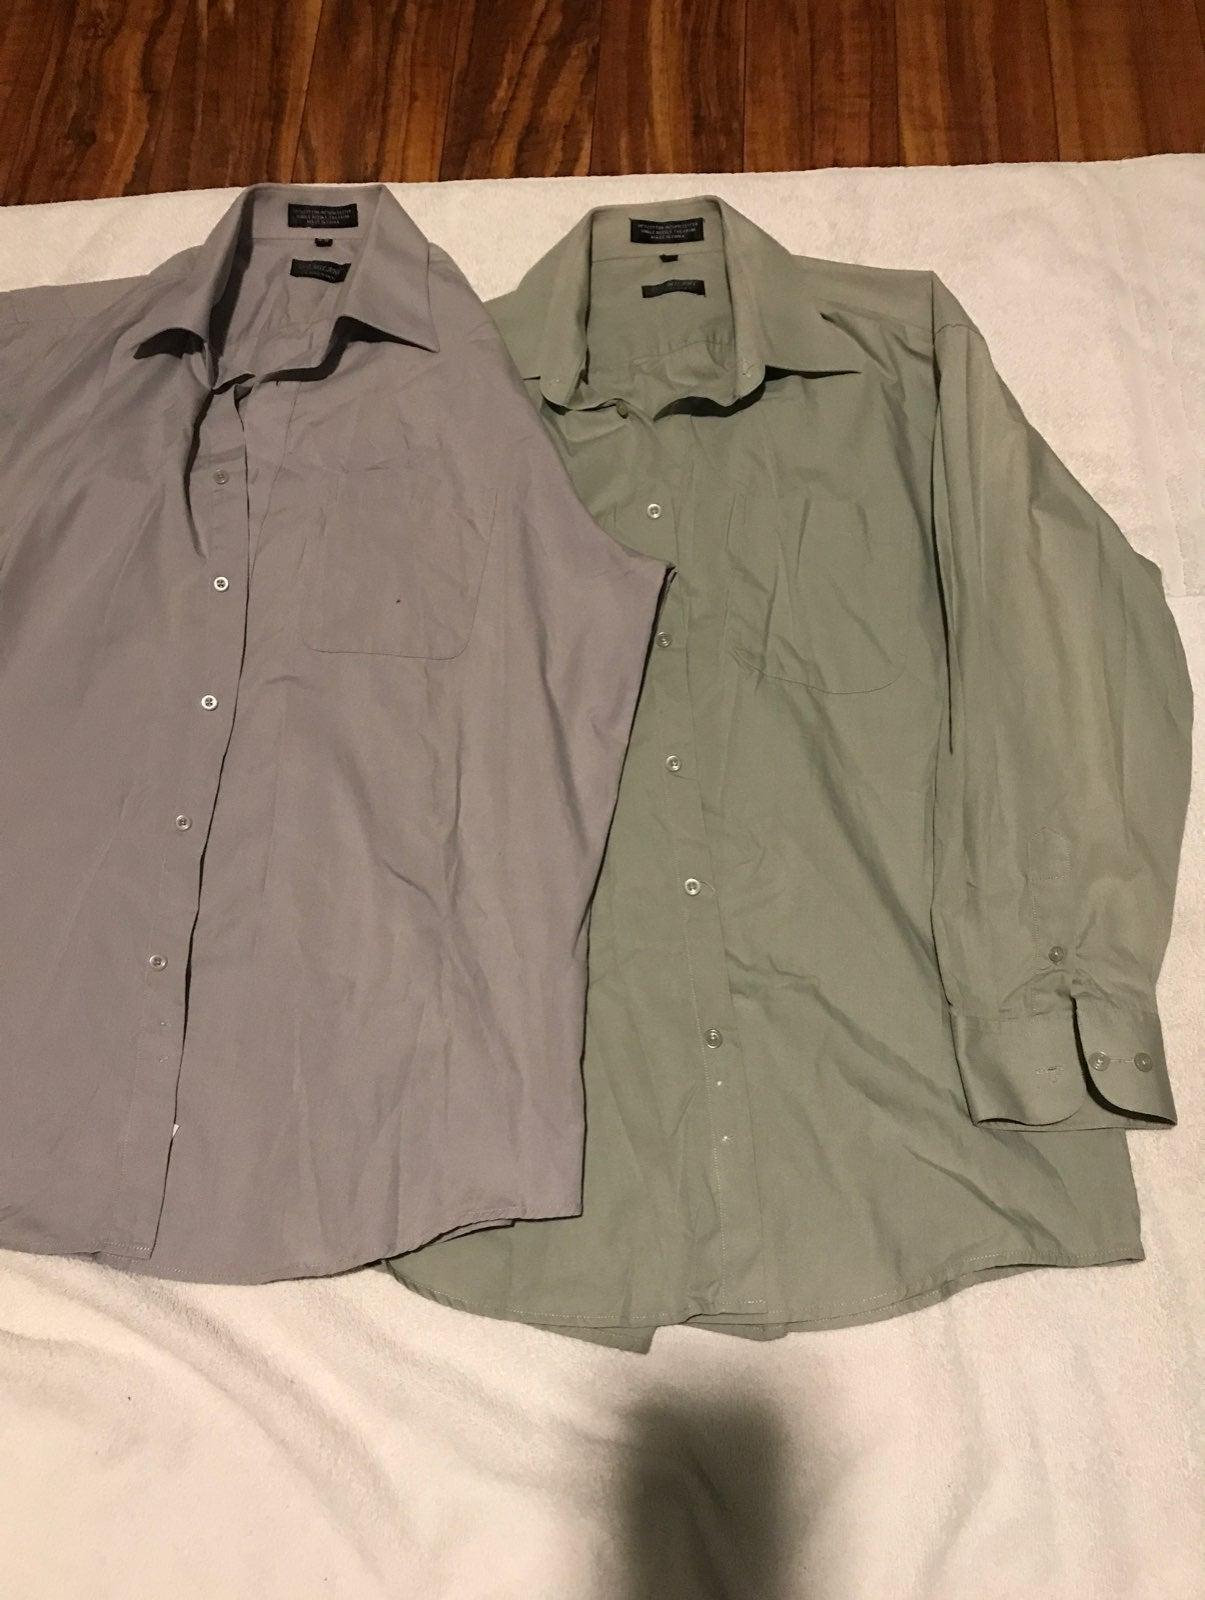 Milani dress shirt